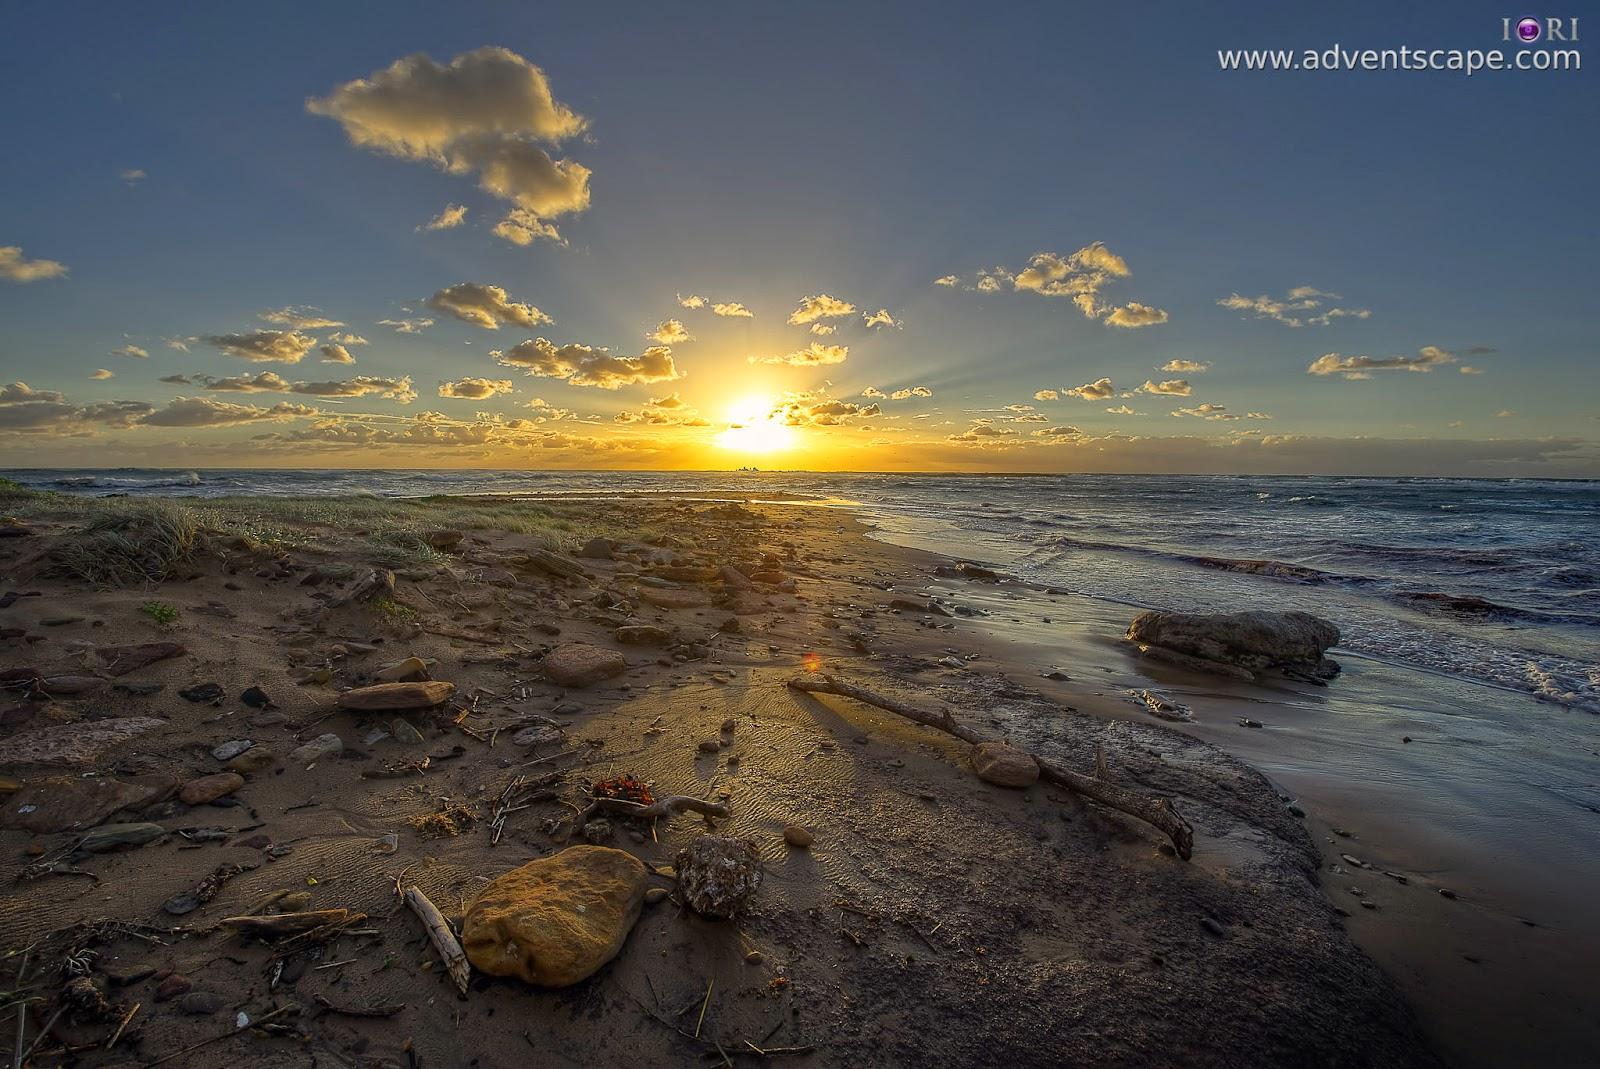 Australia, Australia Landscape Photographer, landscape, Long Reef Reservoir, New South Wales, Northern Beaches, NSW, Philip Avellana, seascape